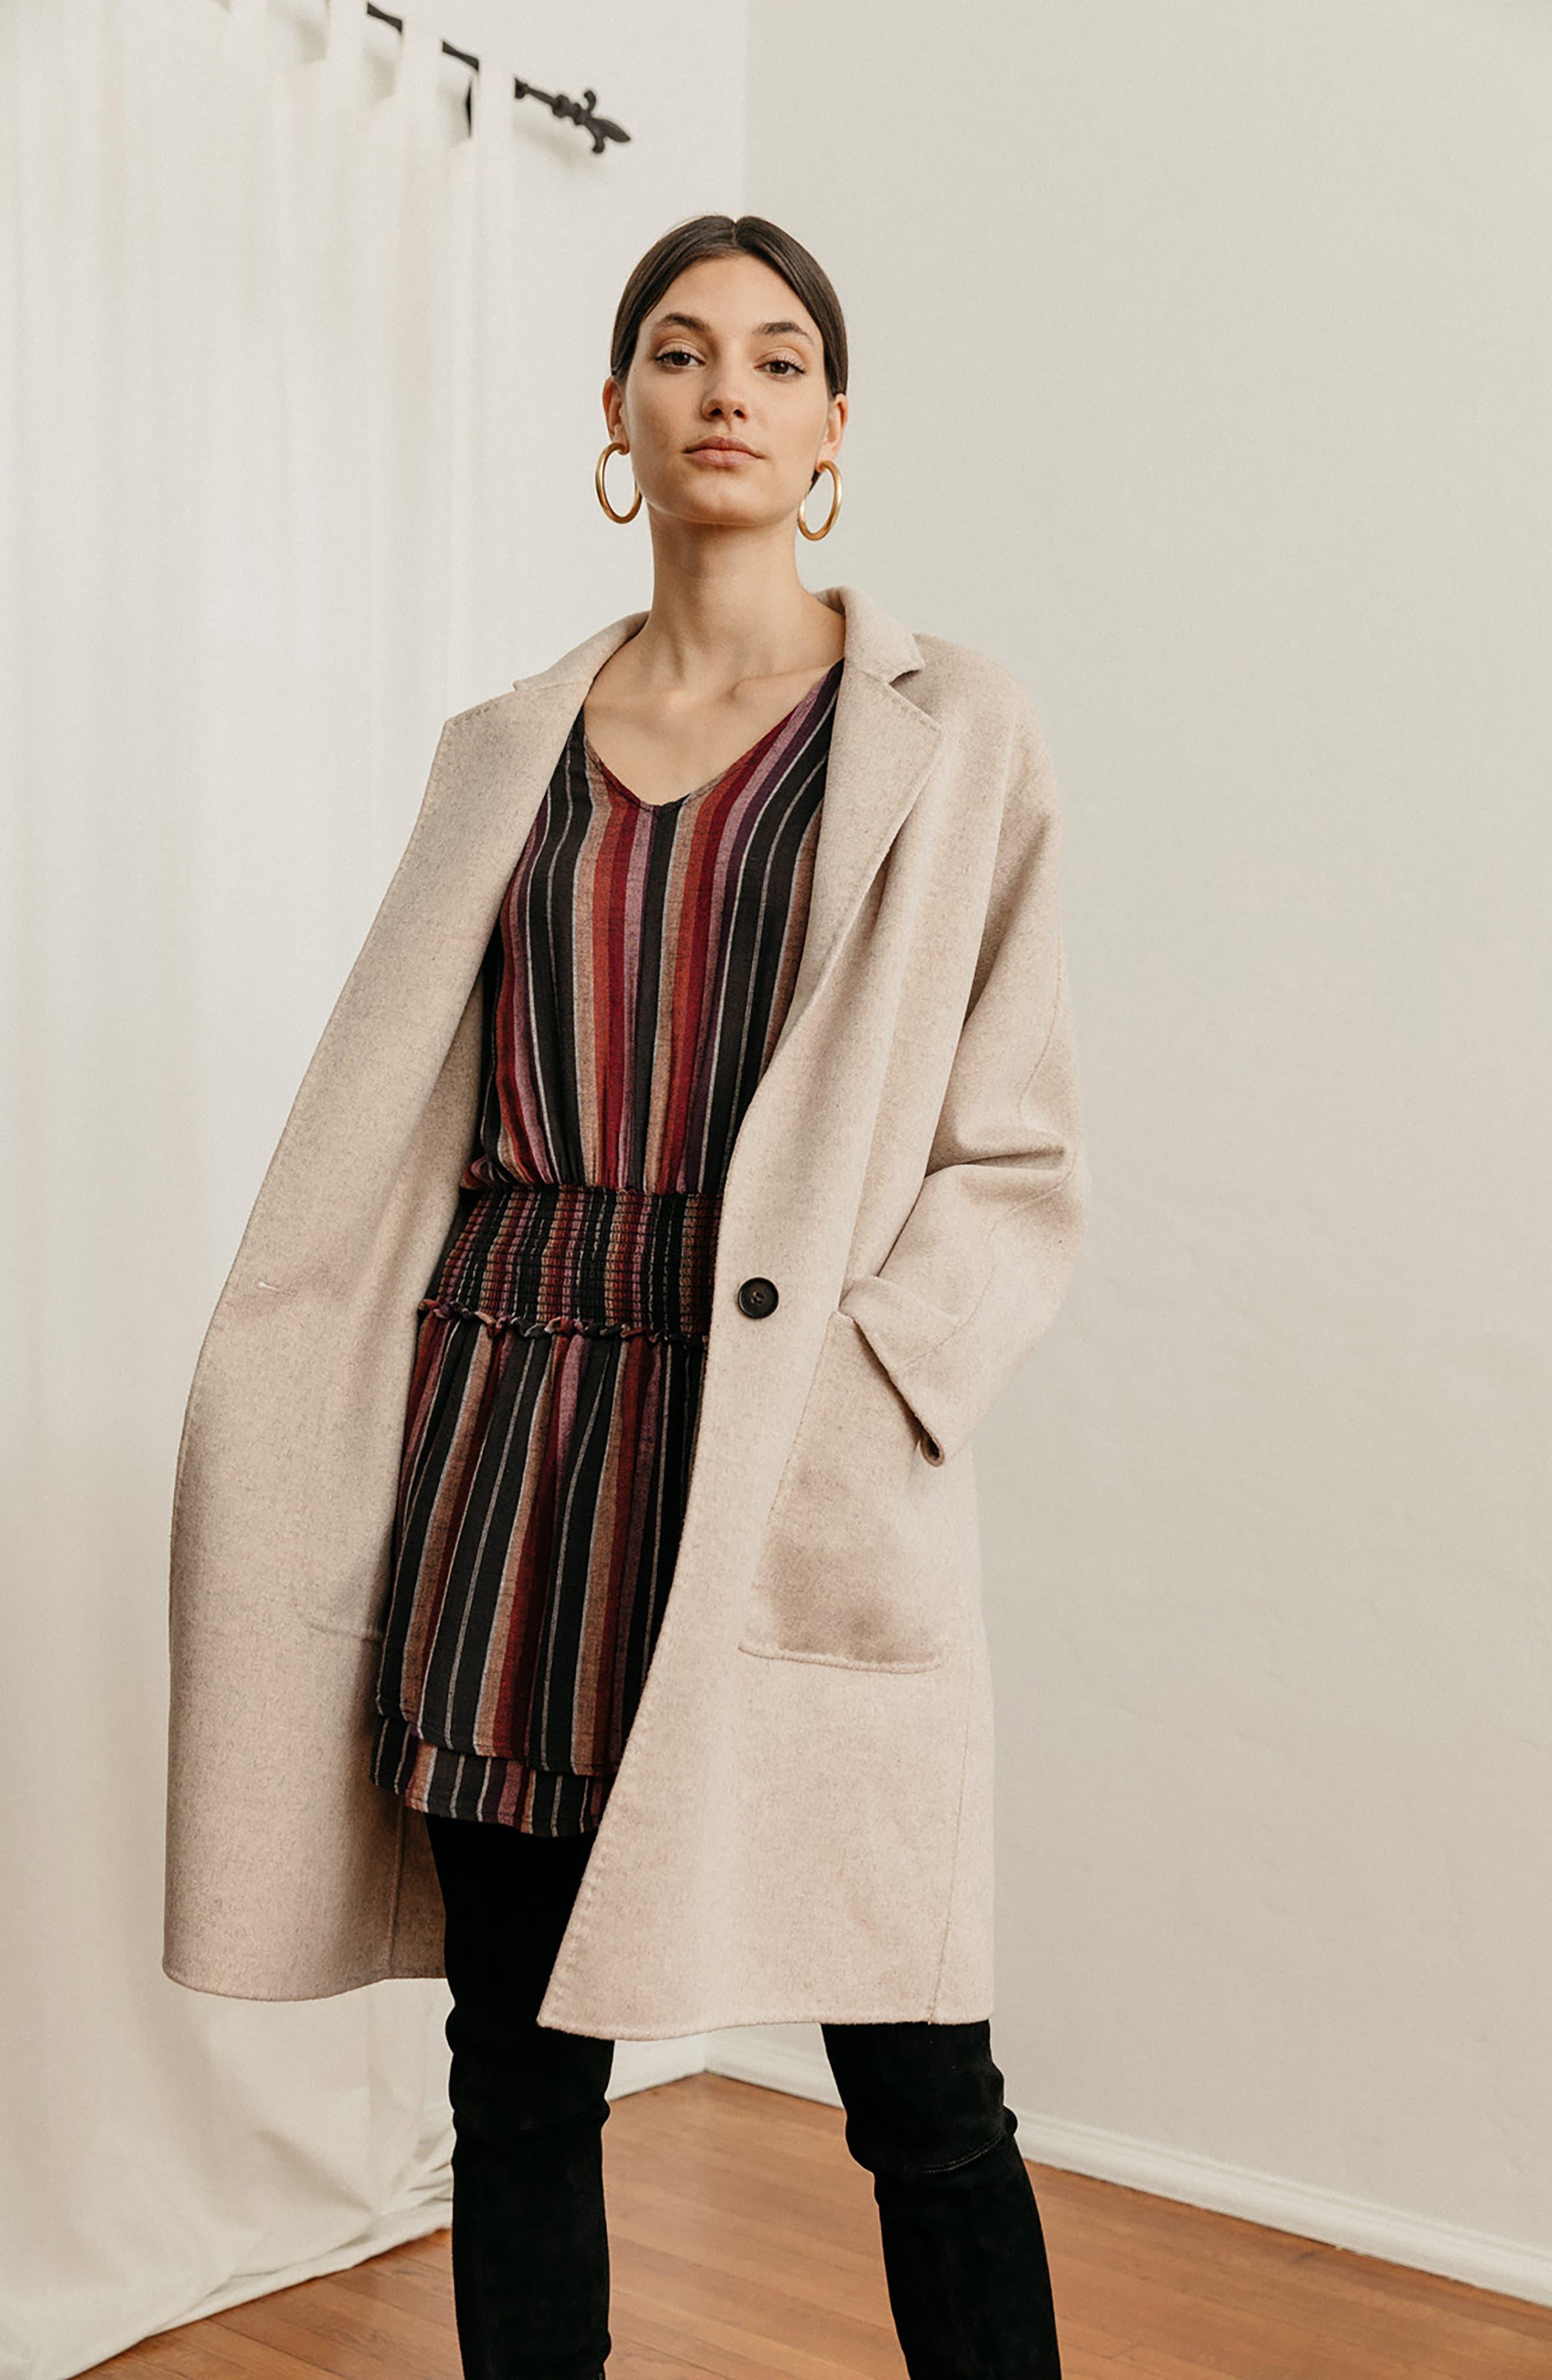 Everest Wool Blend Coat,                             Alternate thumbnail 9, color,                             905